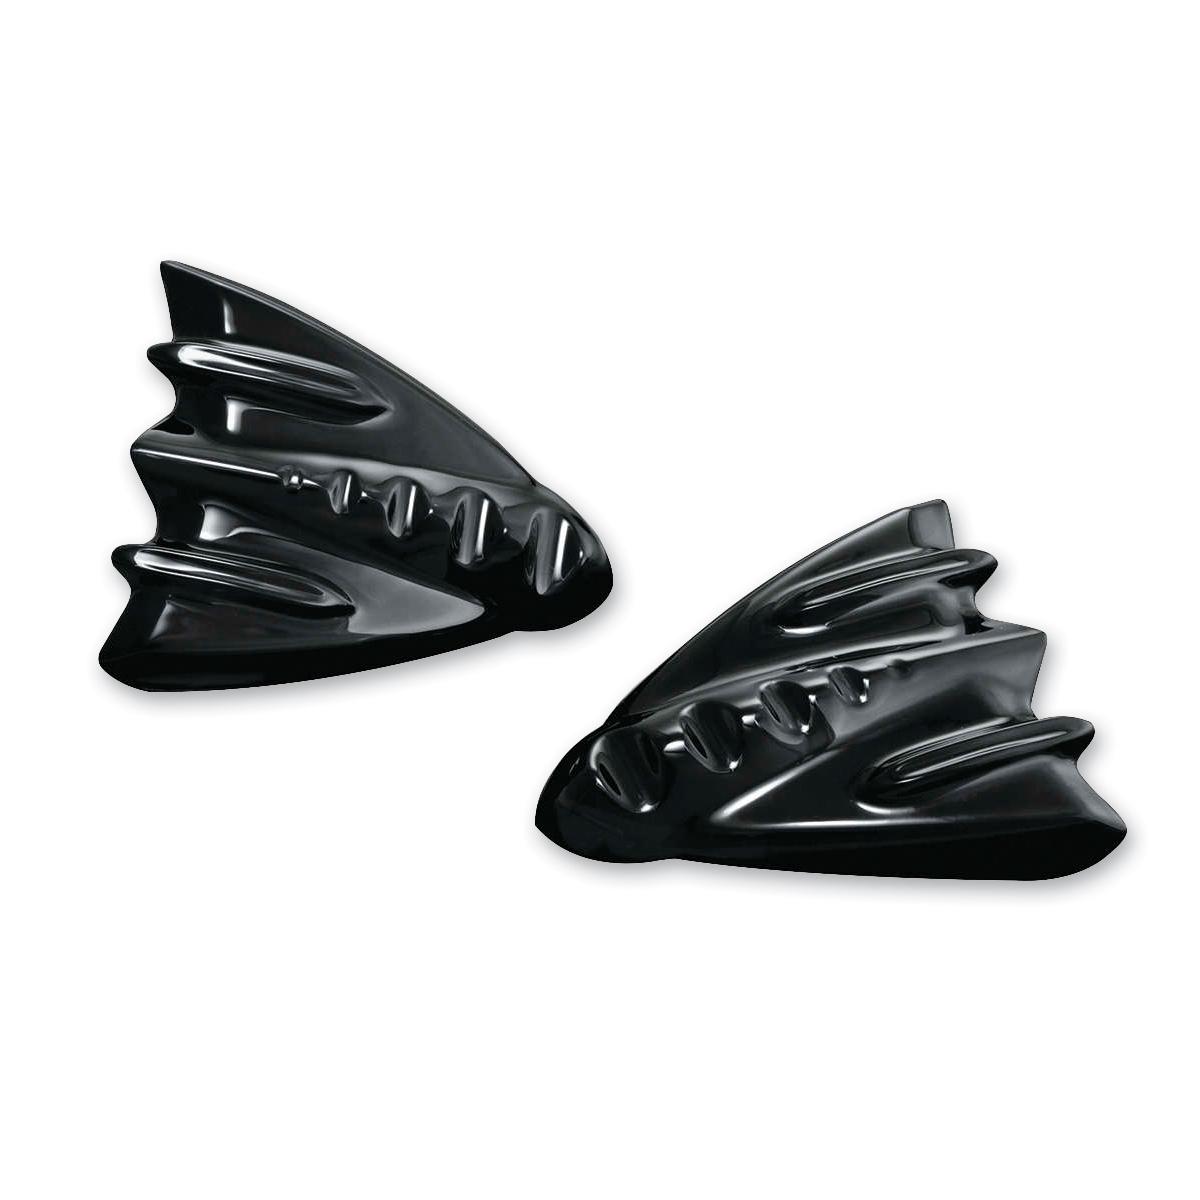 Kuryakyn Black Inner Fairing Mirror Cover